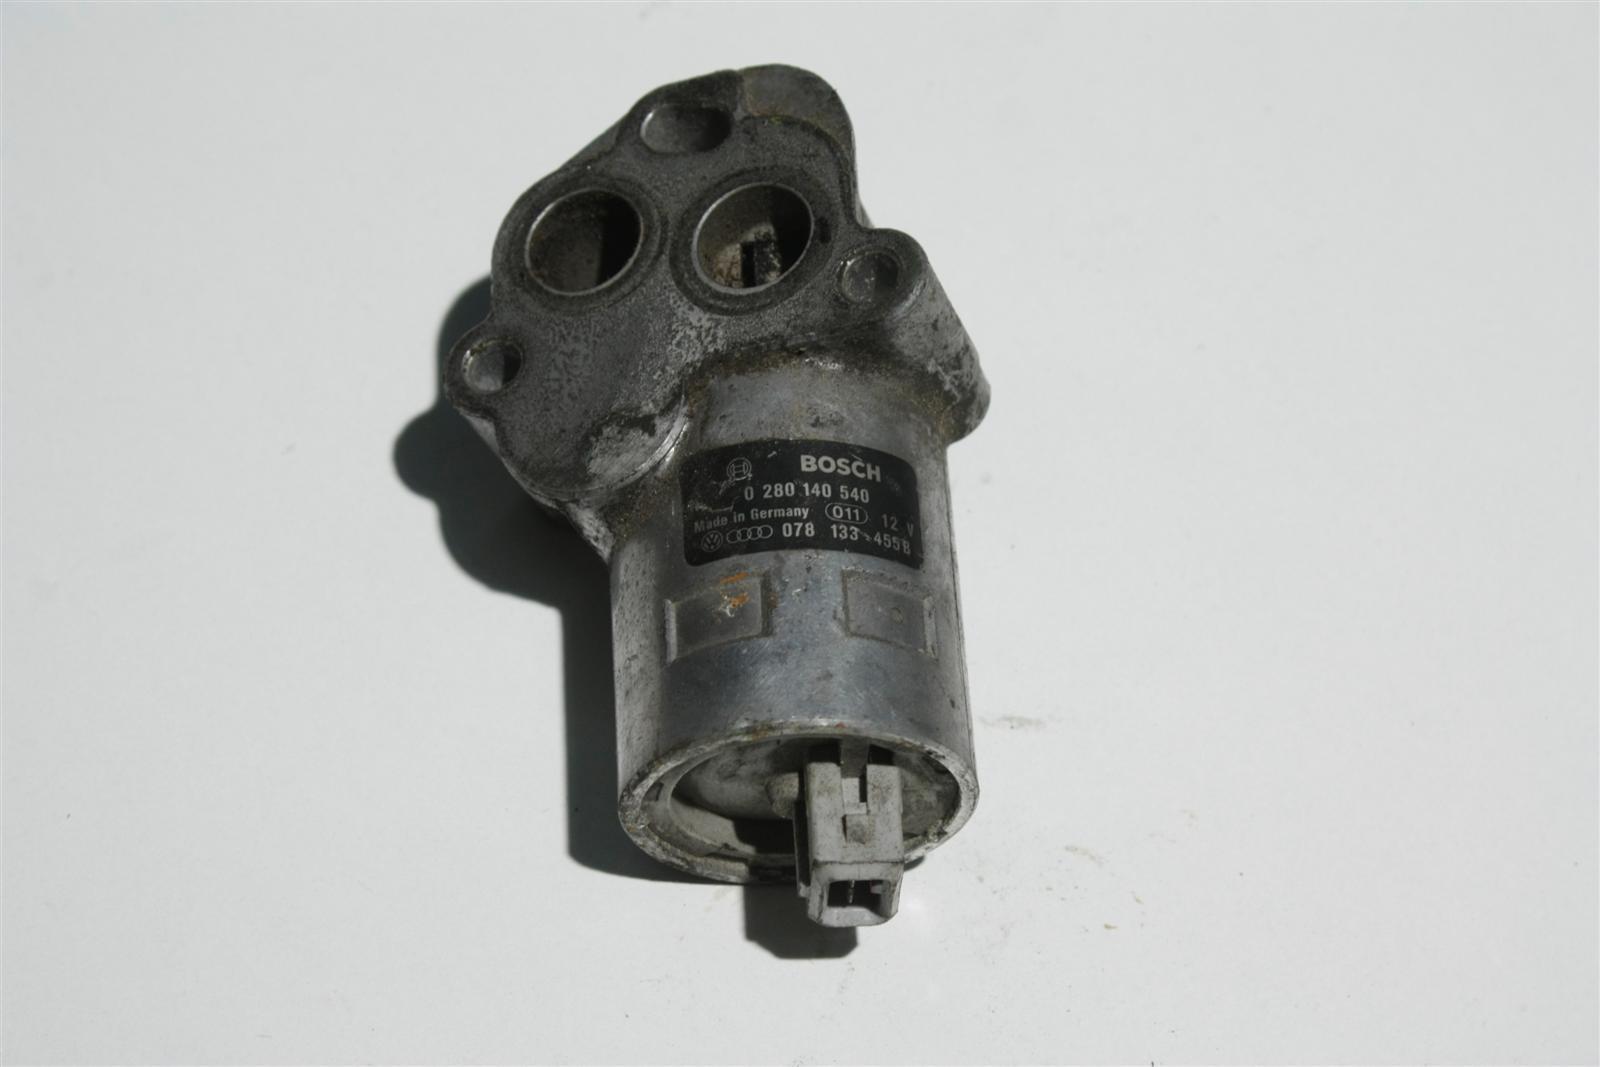 Audi 80/100/A6/A8 2,8l AAH Leerlaufregelventil 078133455B